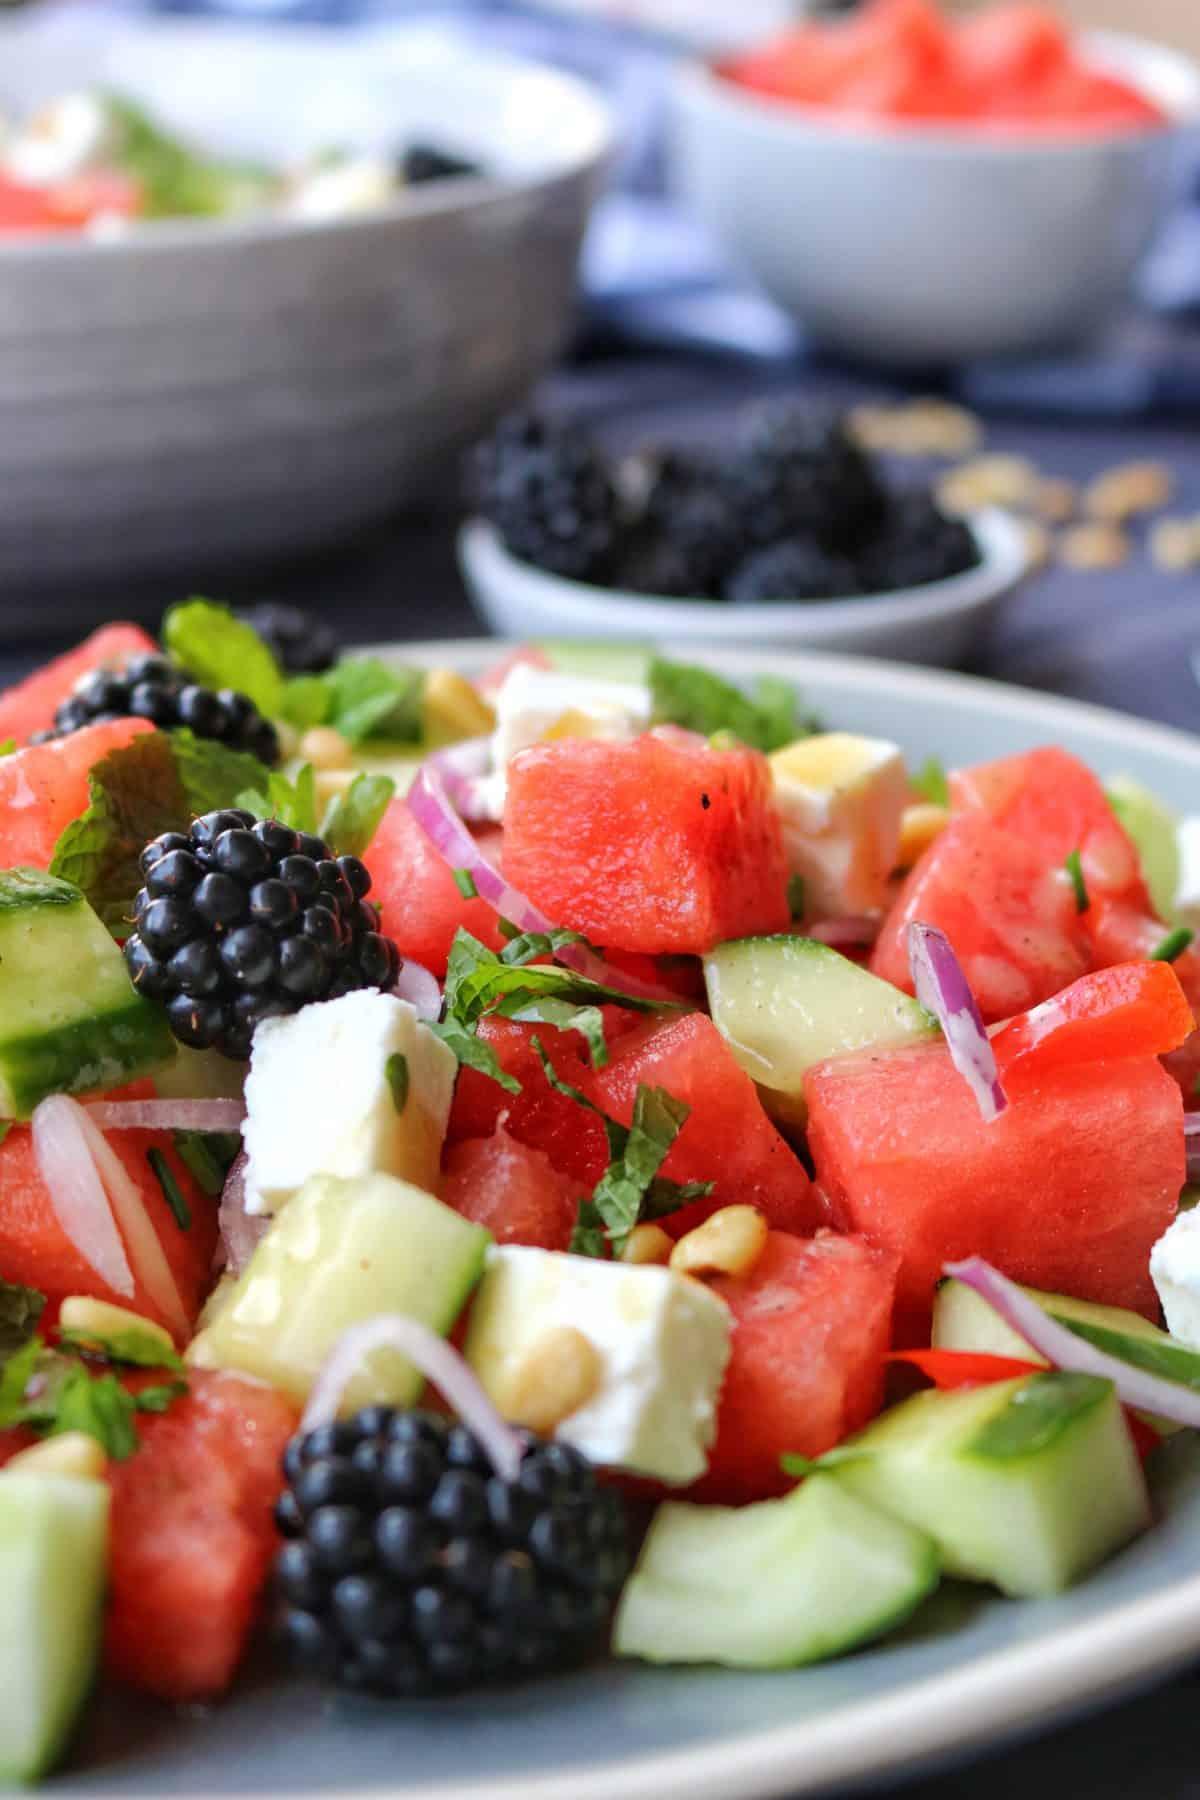 Melone-Feta Salat mit Brombeeren02